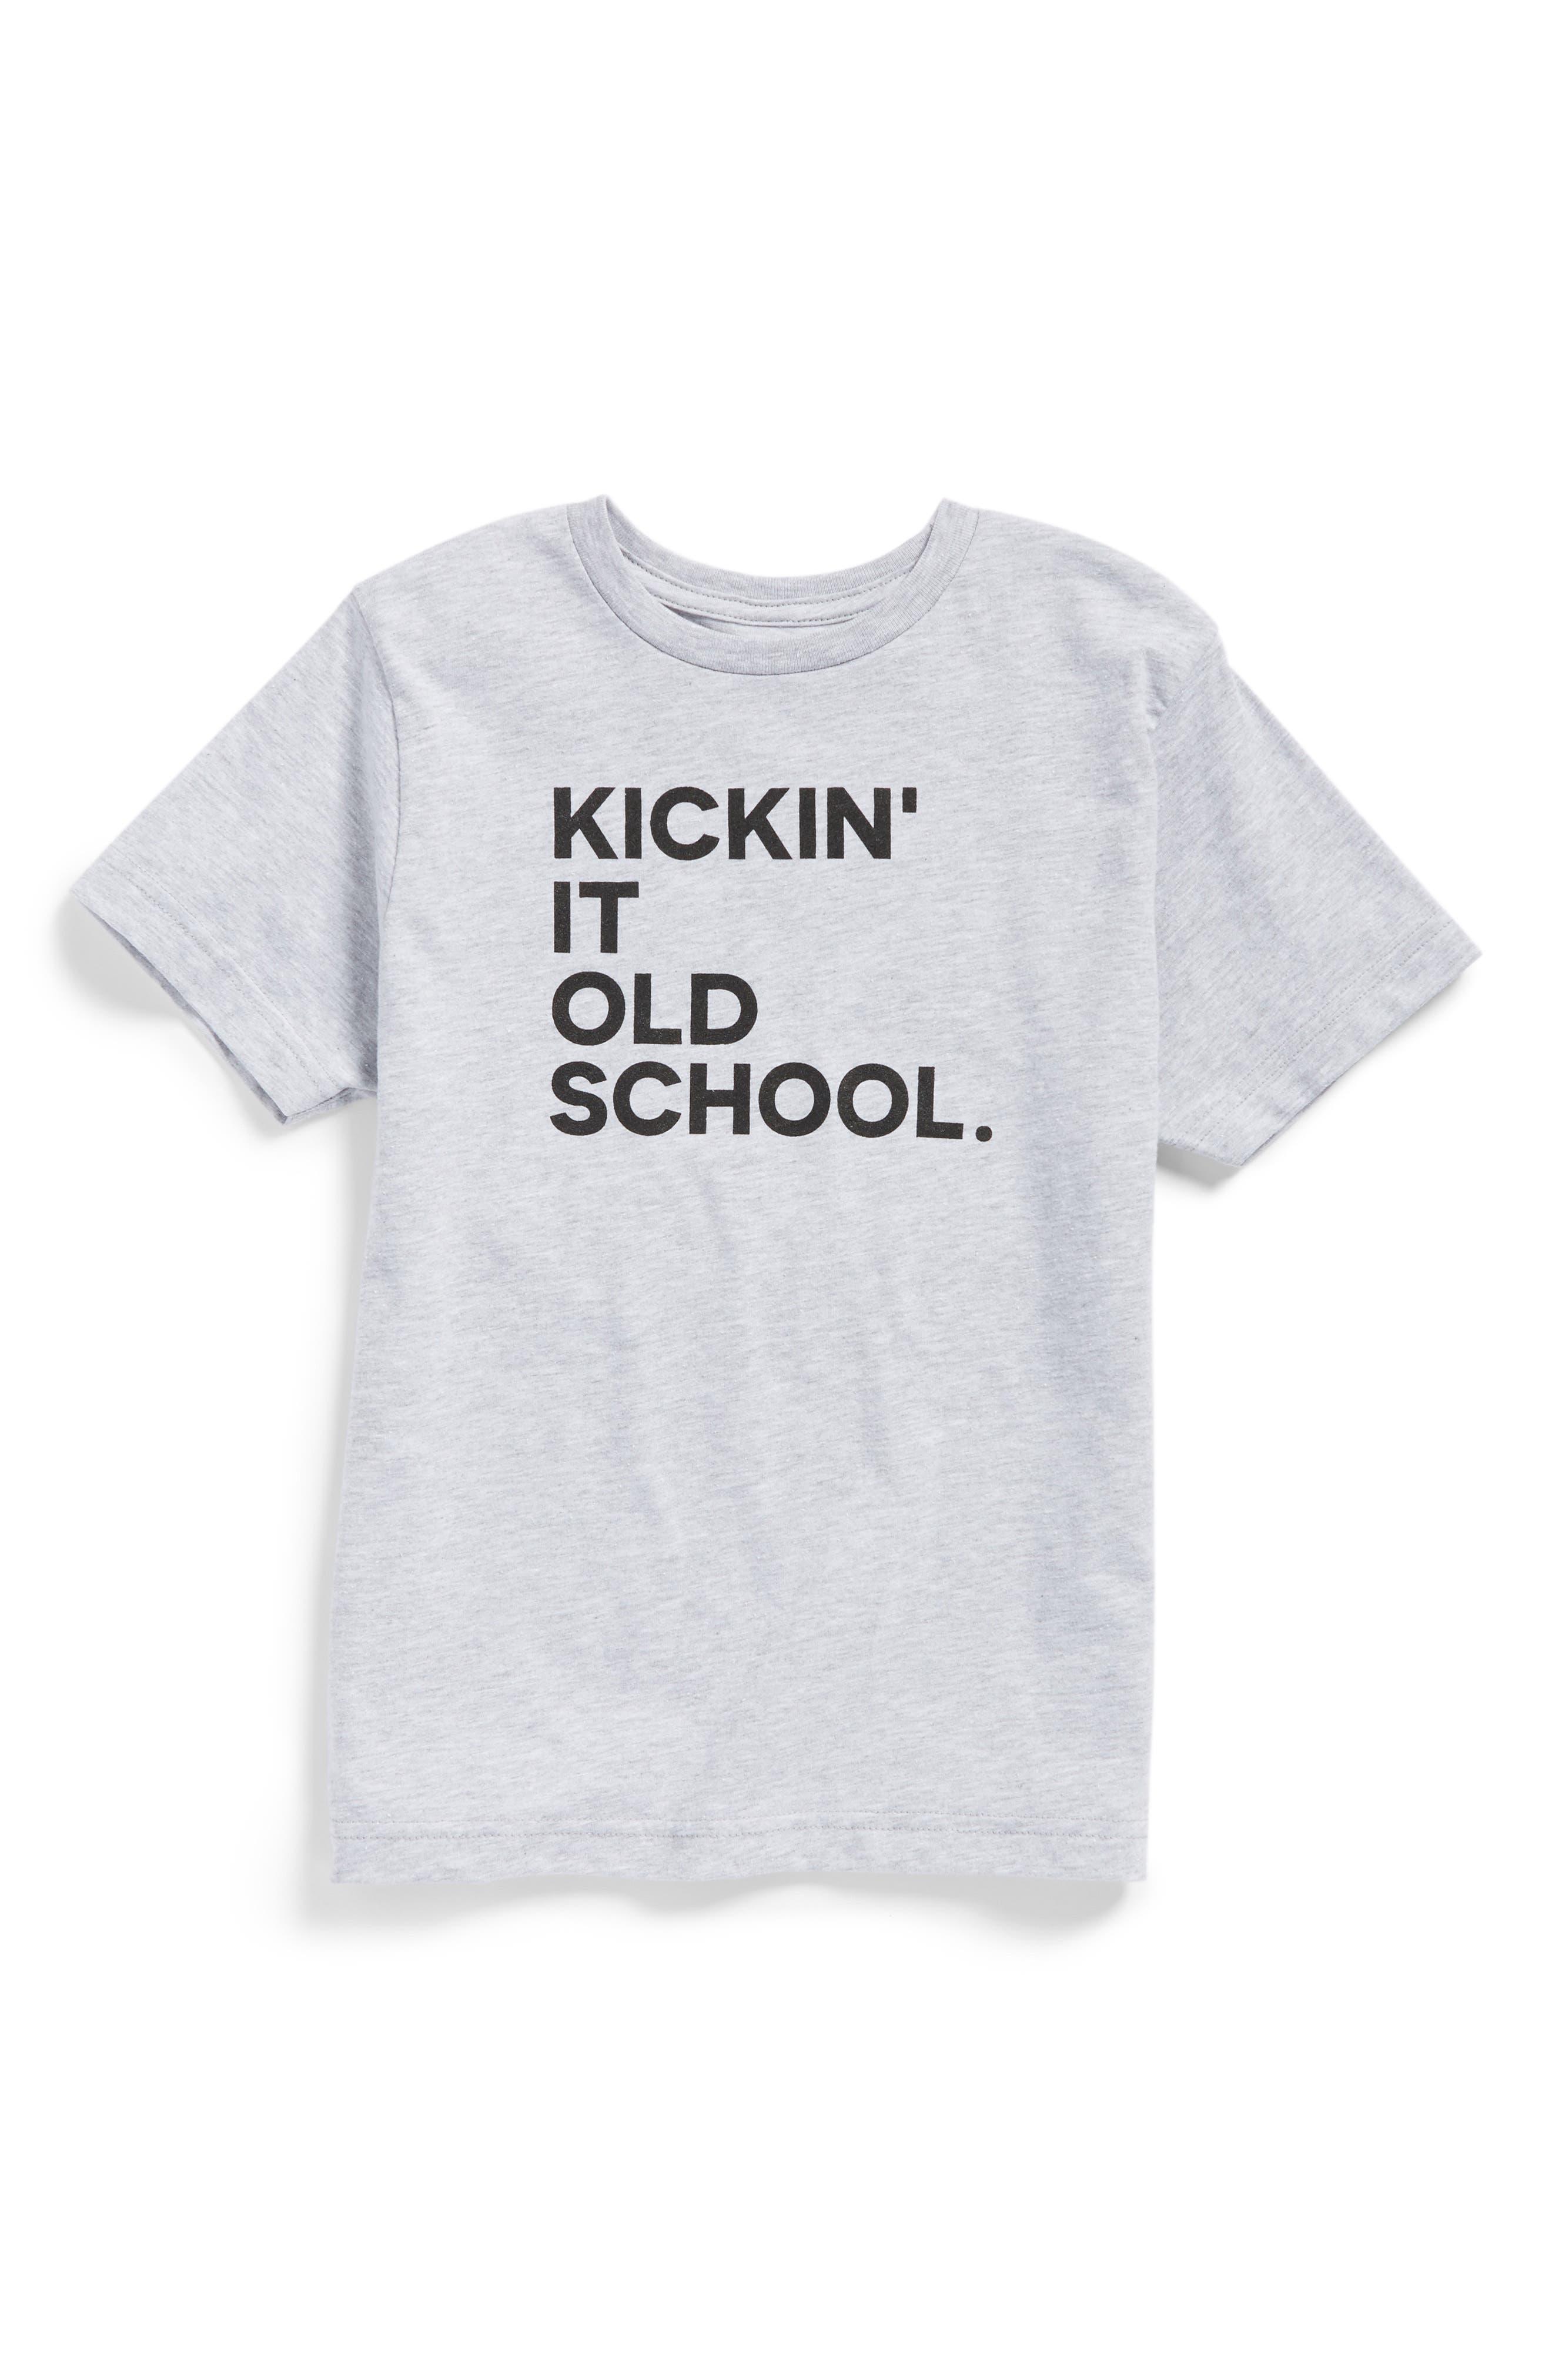 Kickin' It Old School Graphic T-Shirt,                             Main thumbnail 1, color,                             020